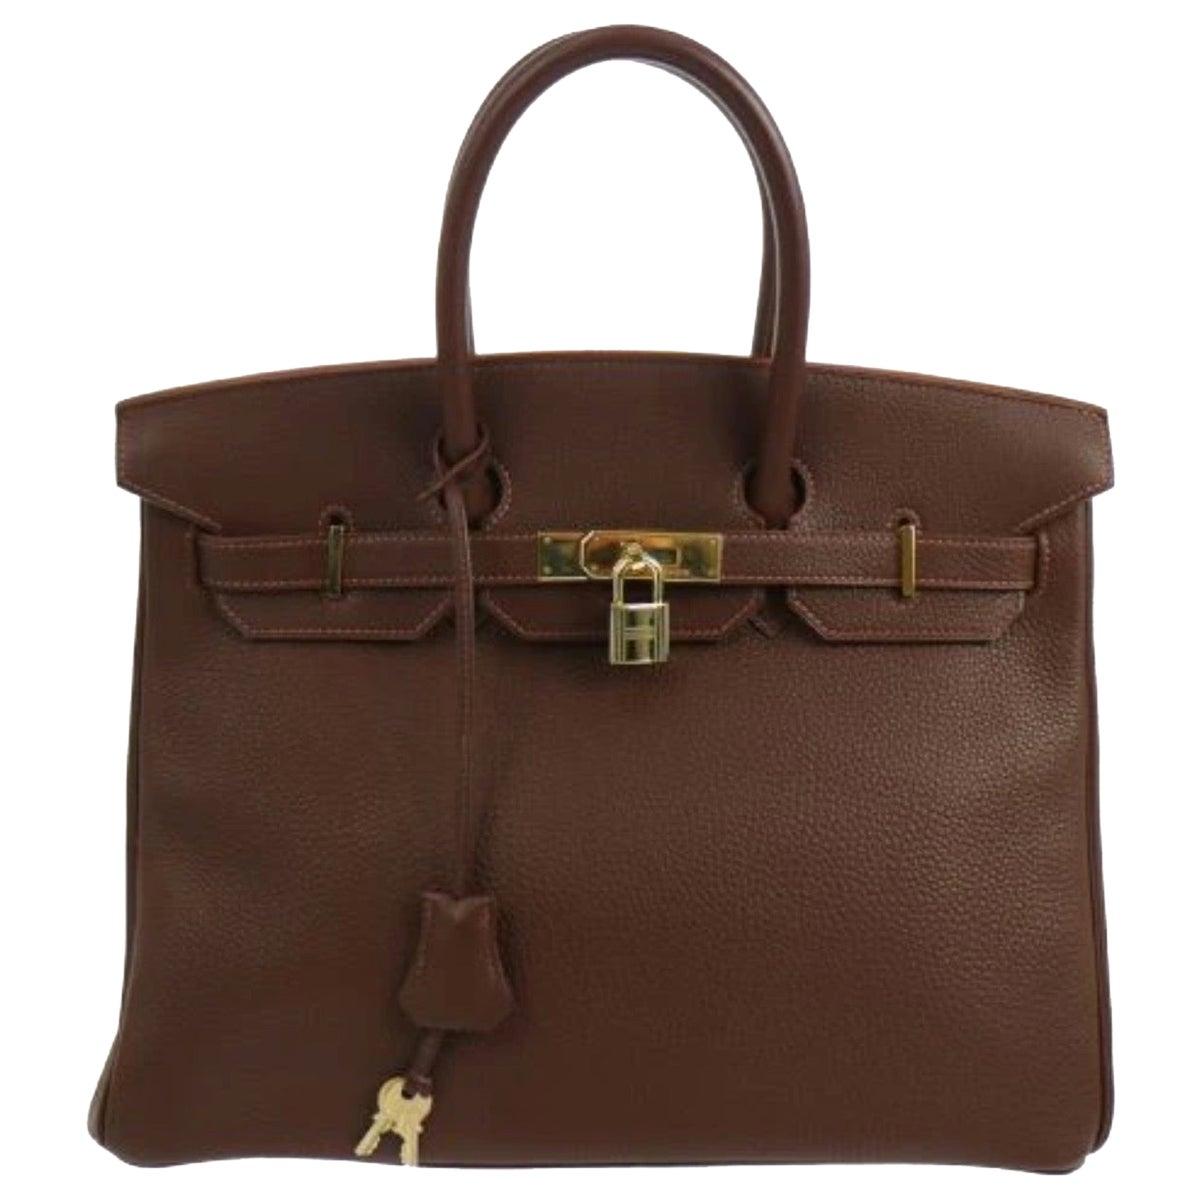 Hermes Birkin 35 Milk Chocolate Brown Gold Top Handle Satchel Tote Bag